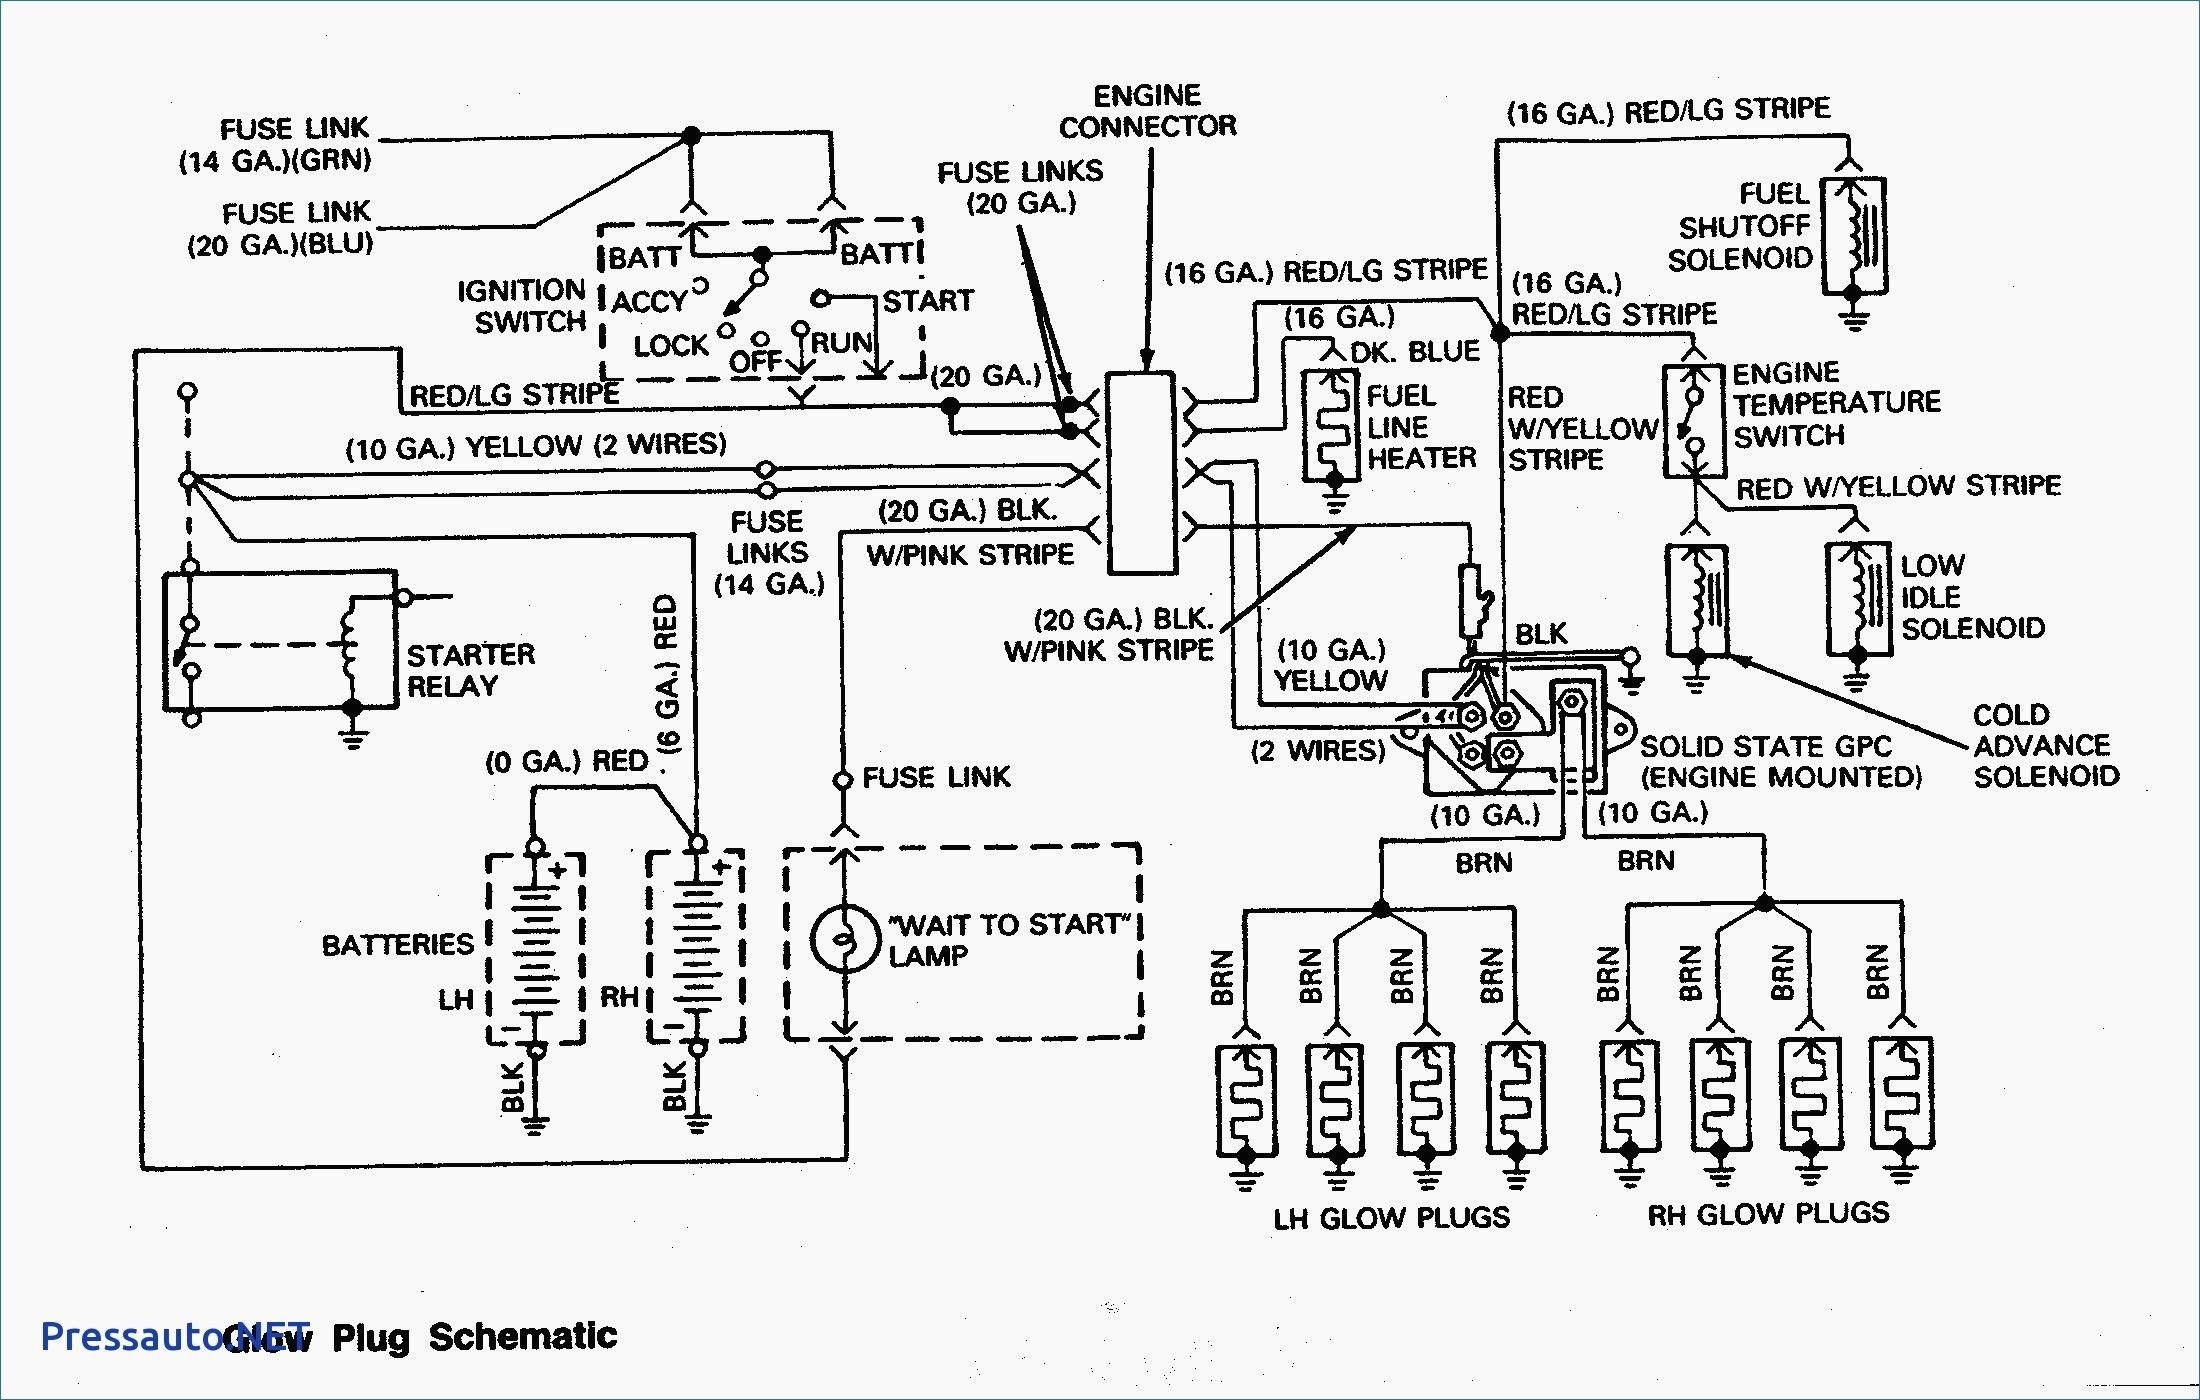 Ford F550 Dump Truck Wiring Diagram